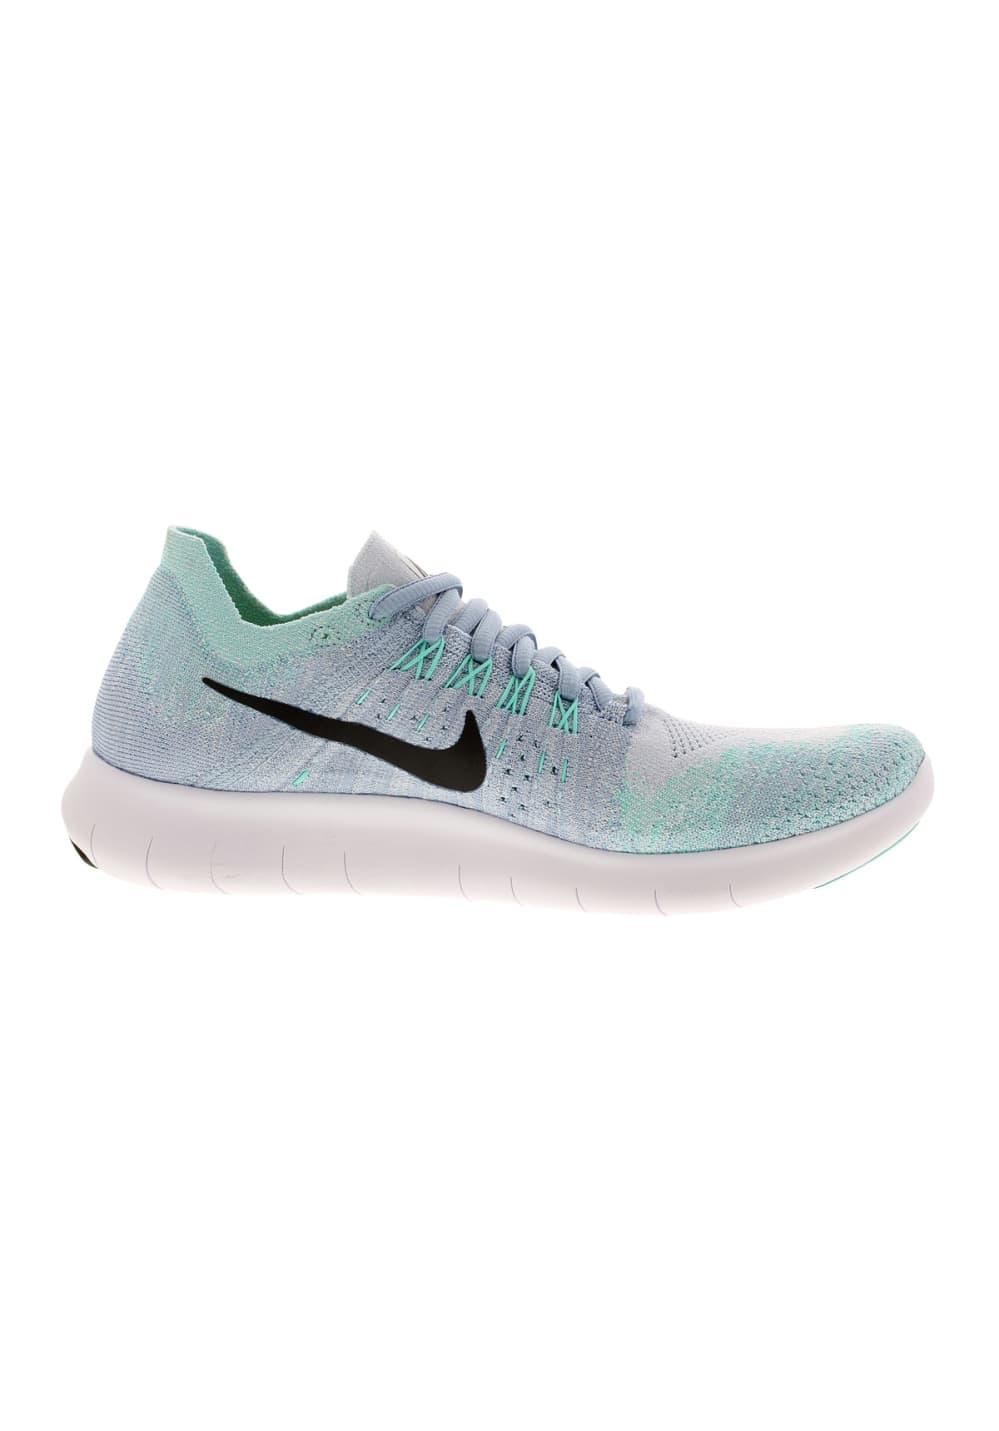 Nike Free Femme Bleu Rn 2017 Chaussures Flyknit Running Pour Om8nvN0w